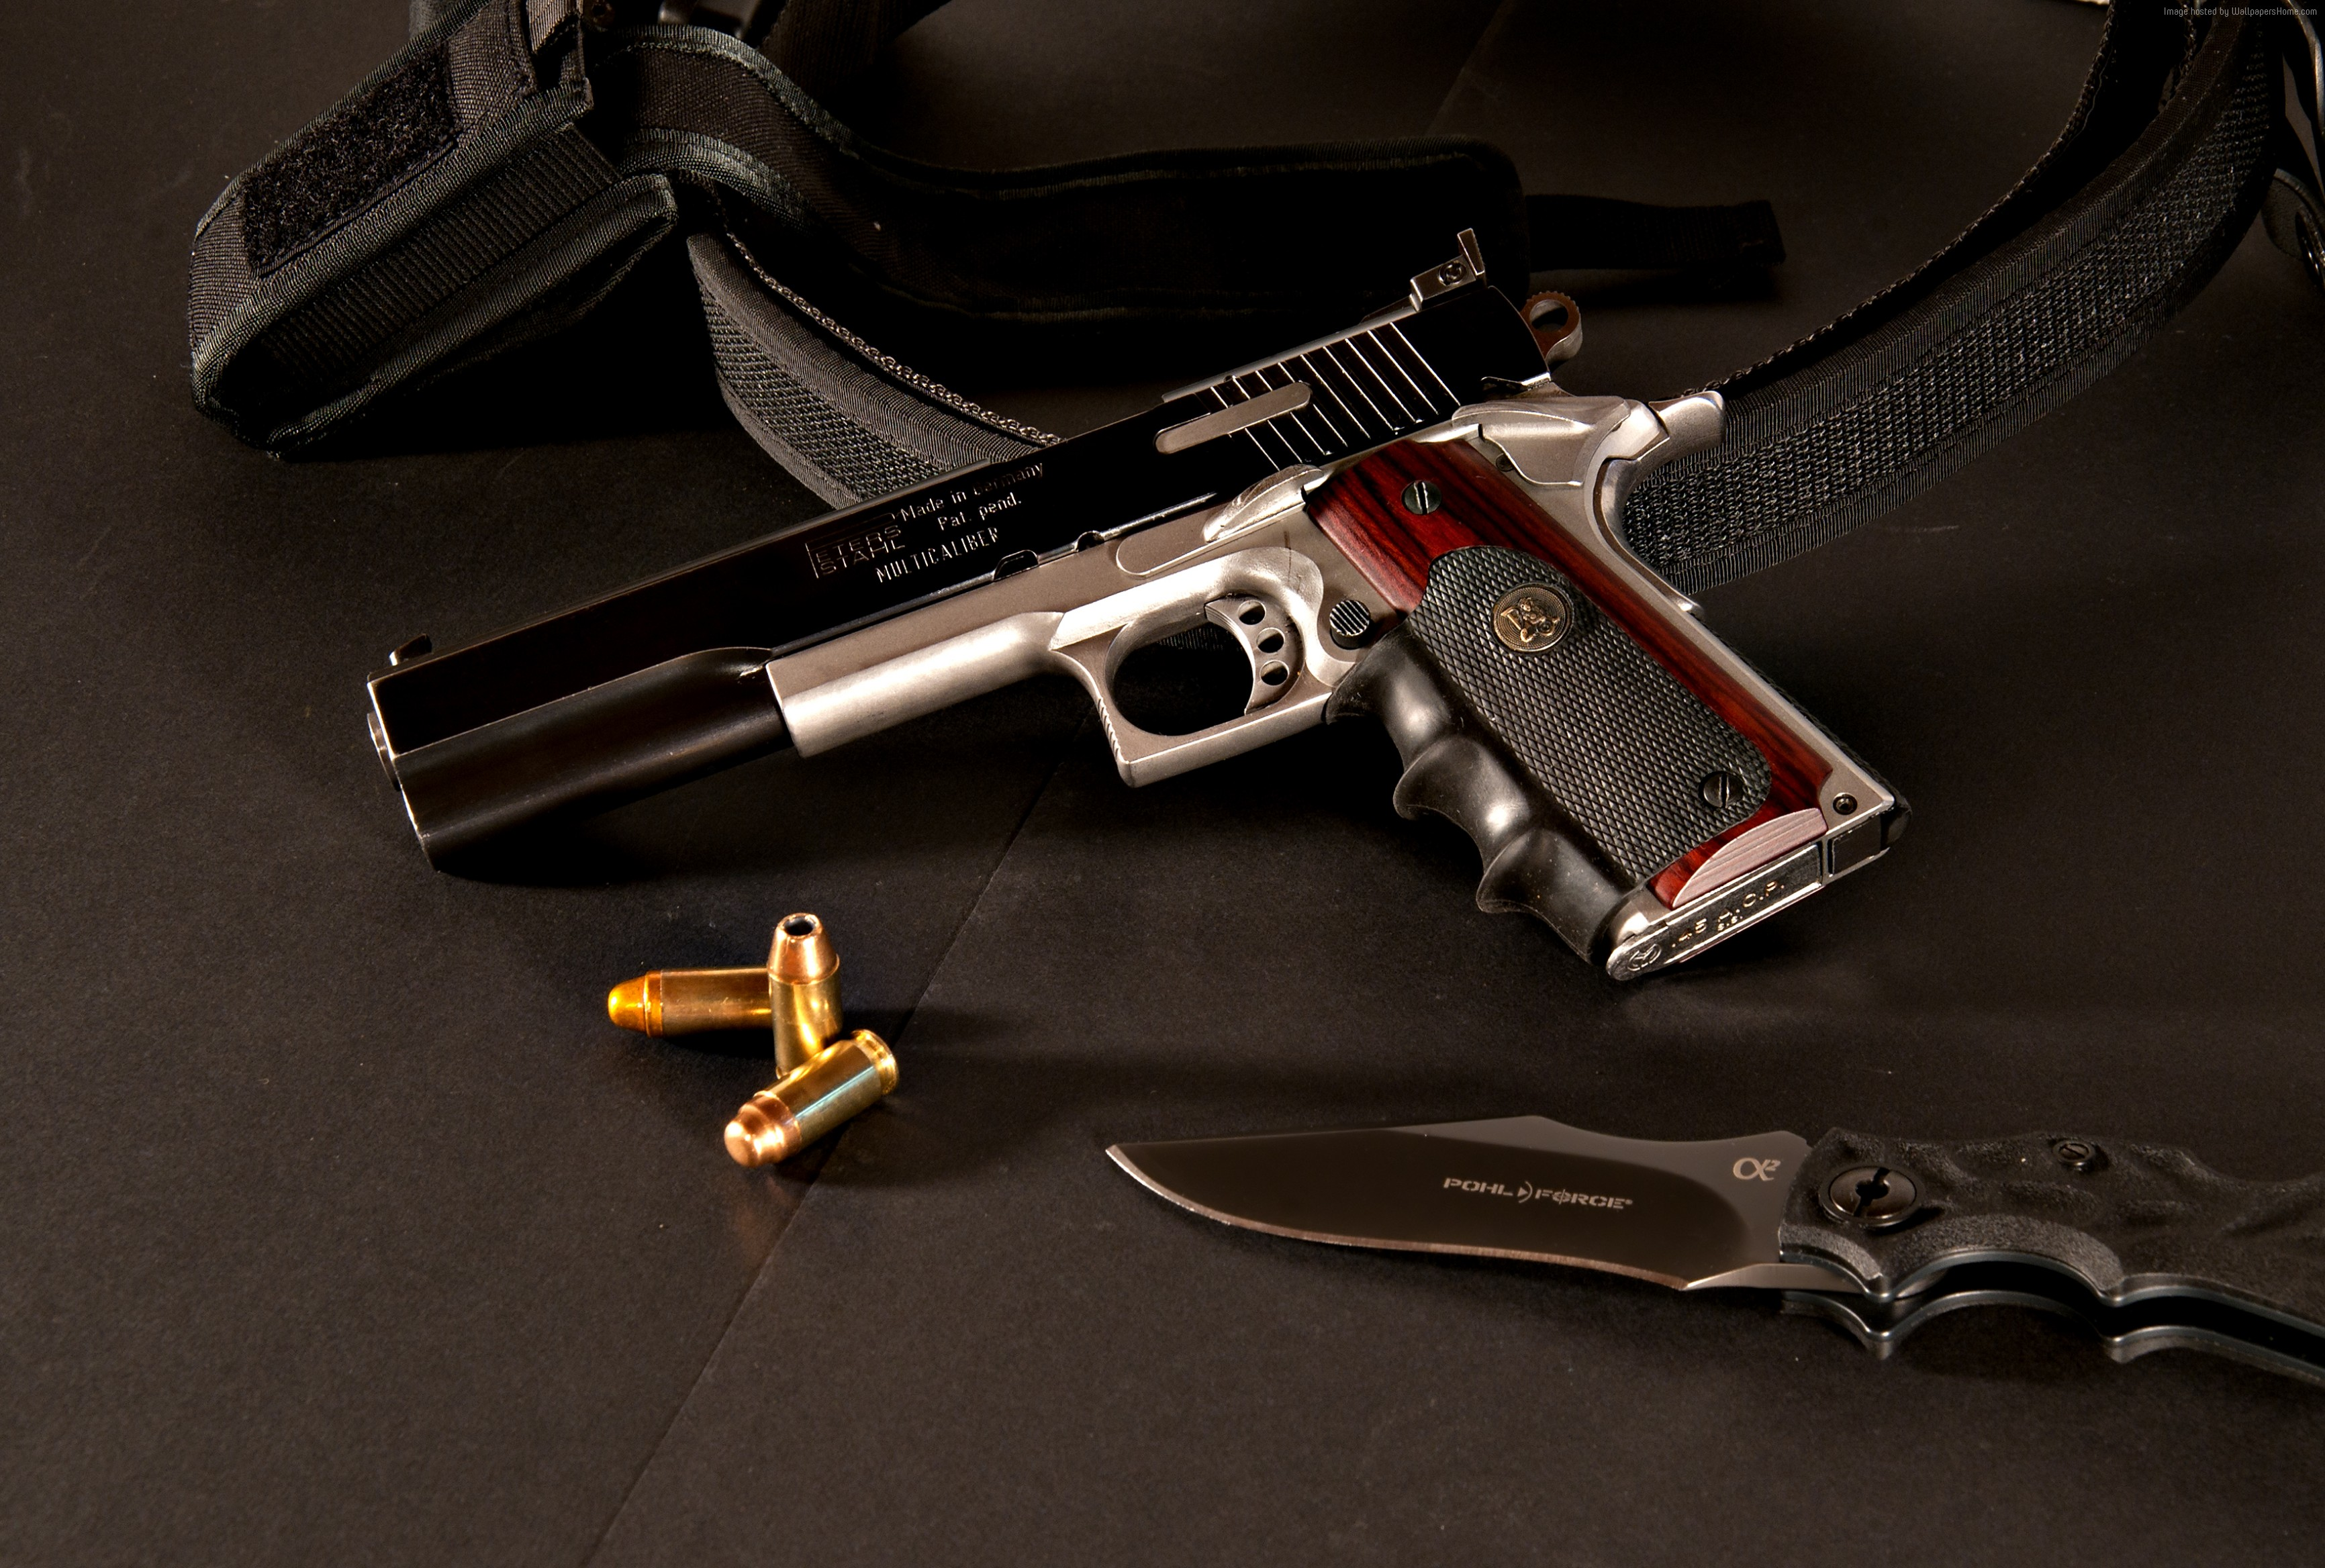 Peters Stahl Wallpaper Military Weapons Peters Stahl pistol 3463x2336